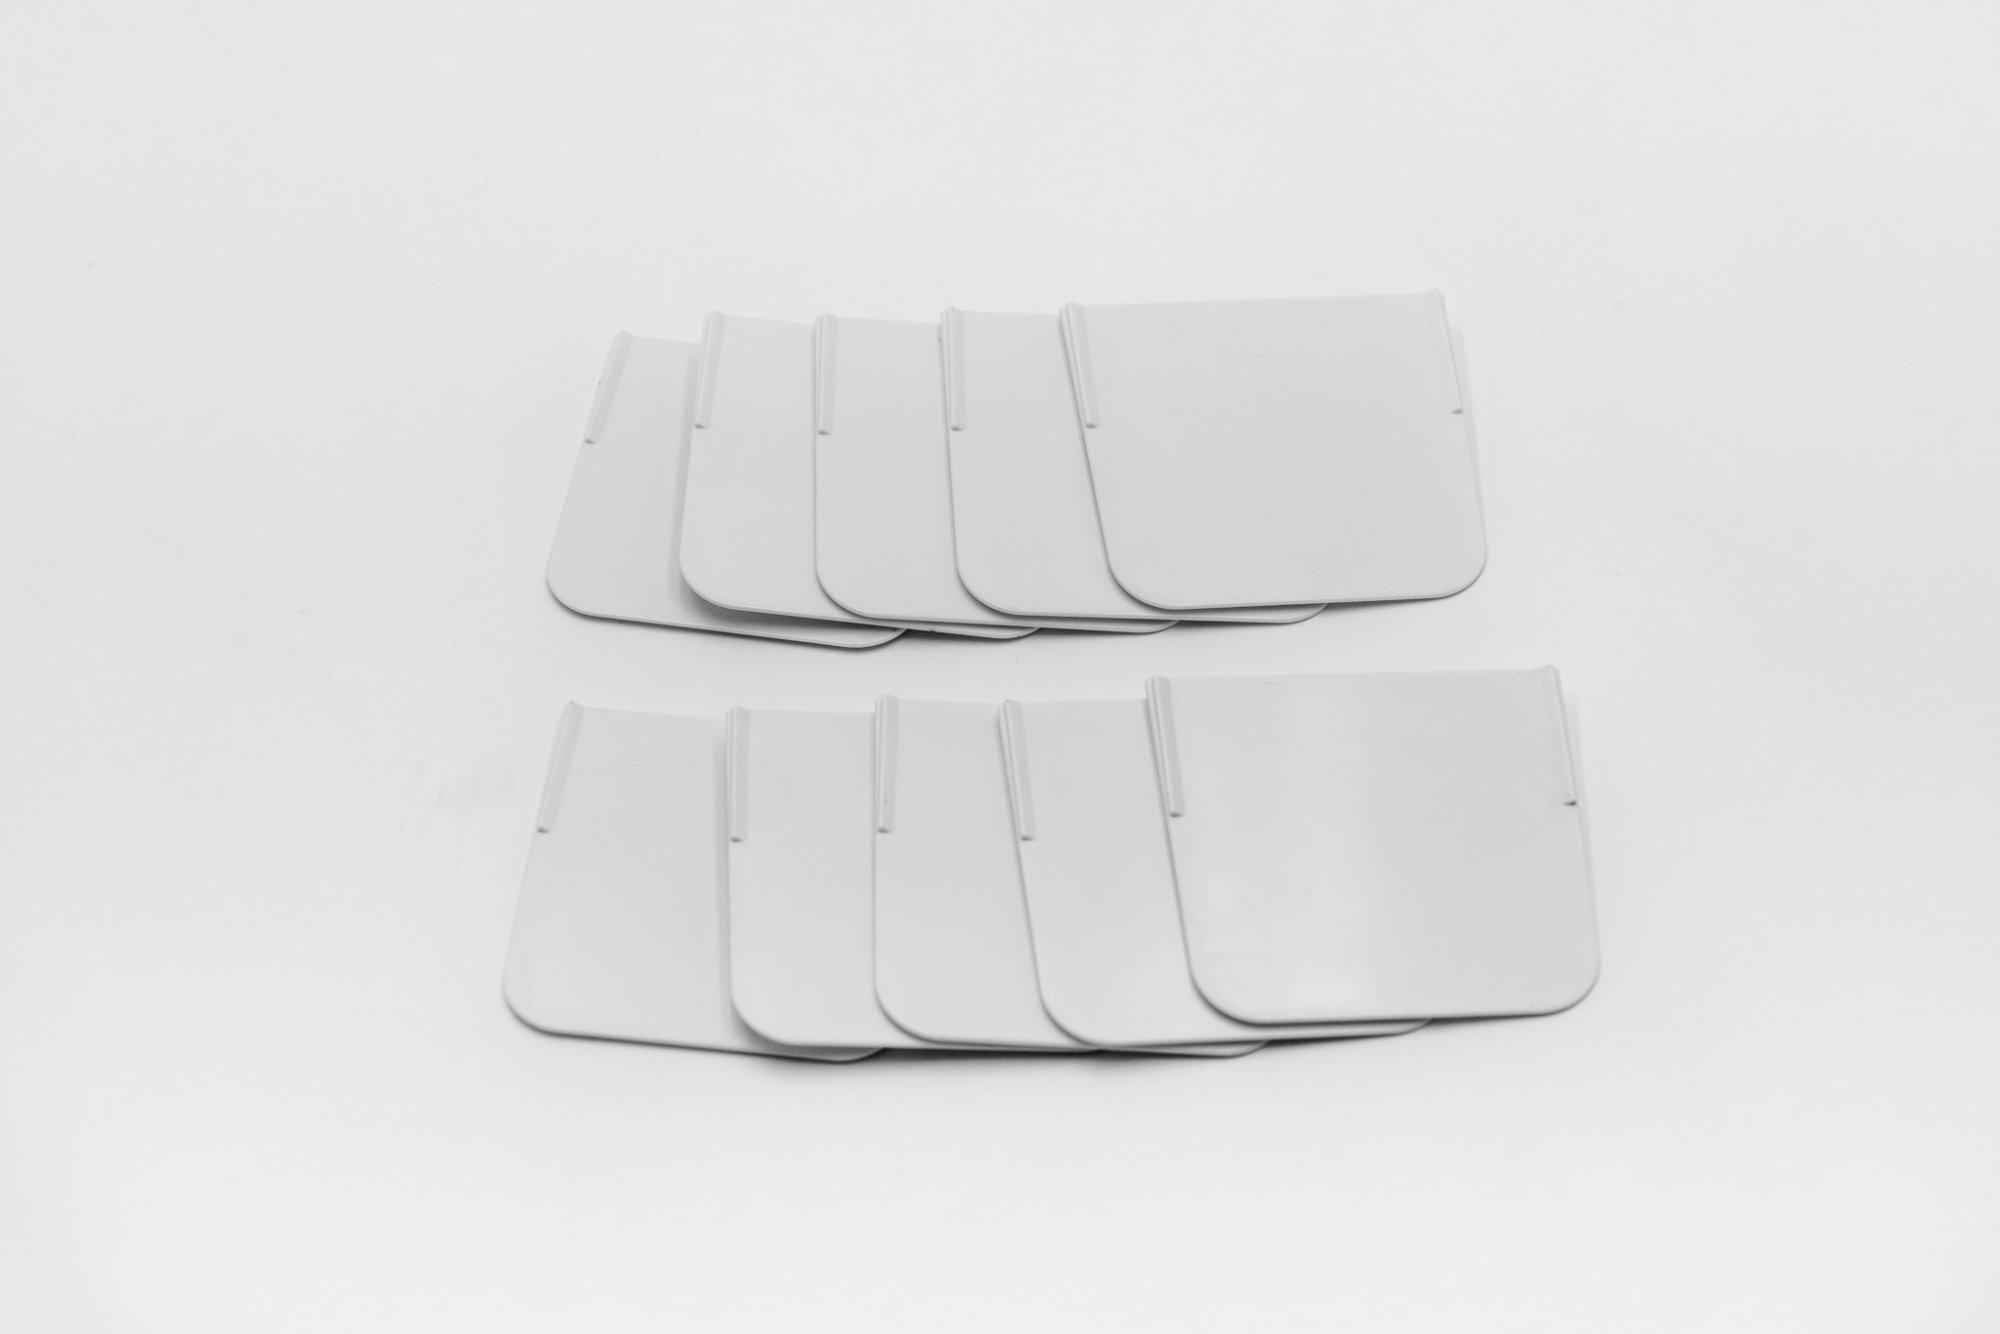 Handi Quilter Tool Tray 2 Extension Kit